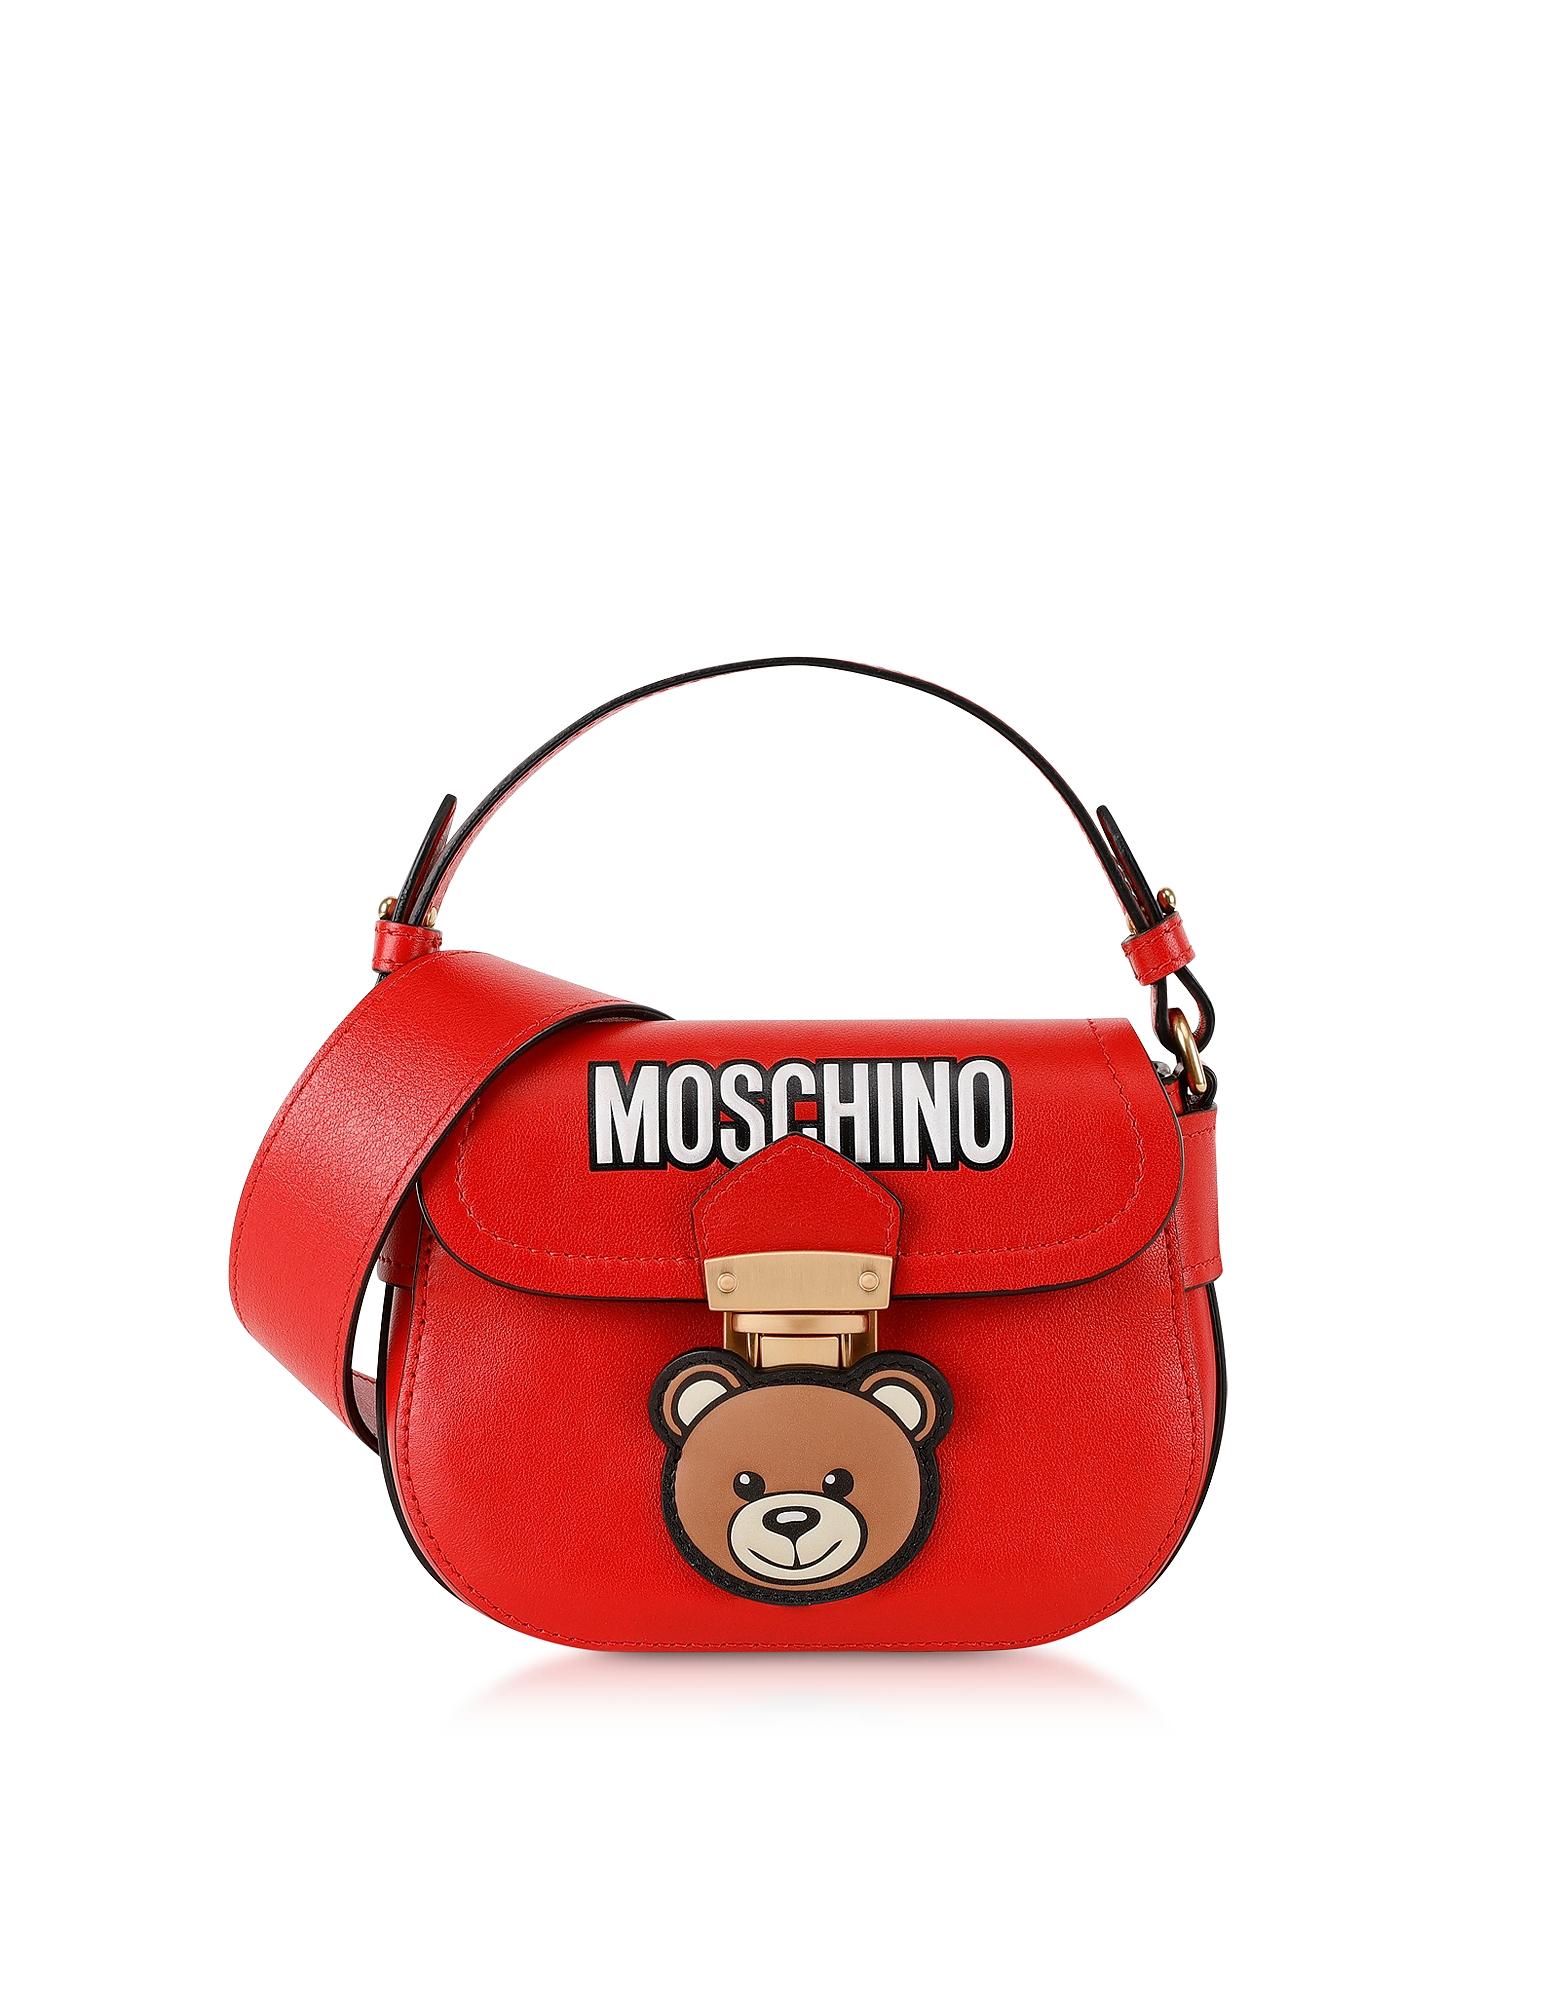 Moschino Handbags, Small Red Leather Teddy Bear Shoulder Bag